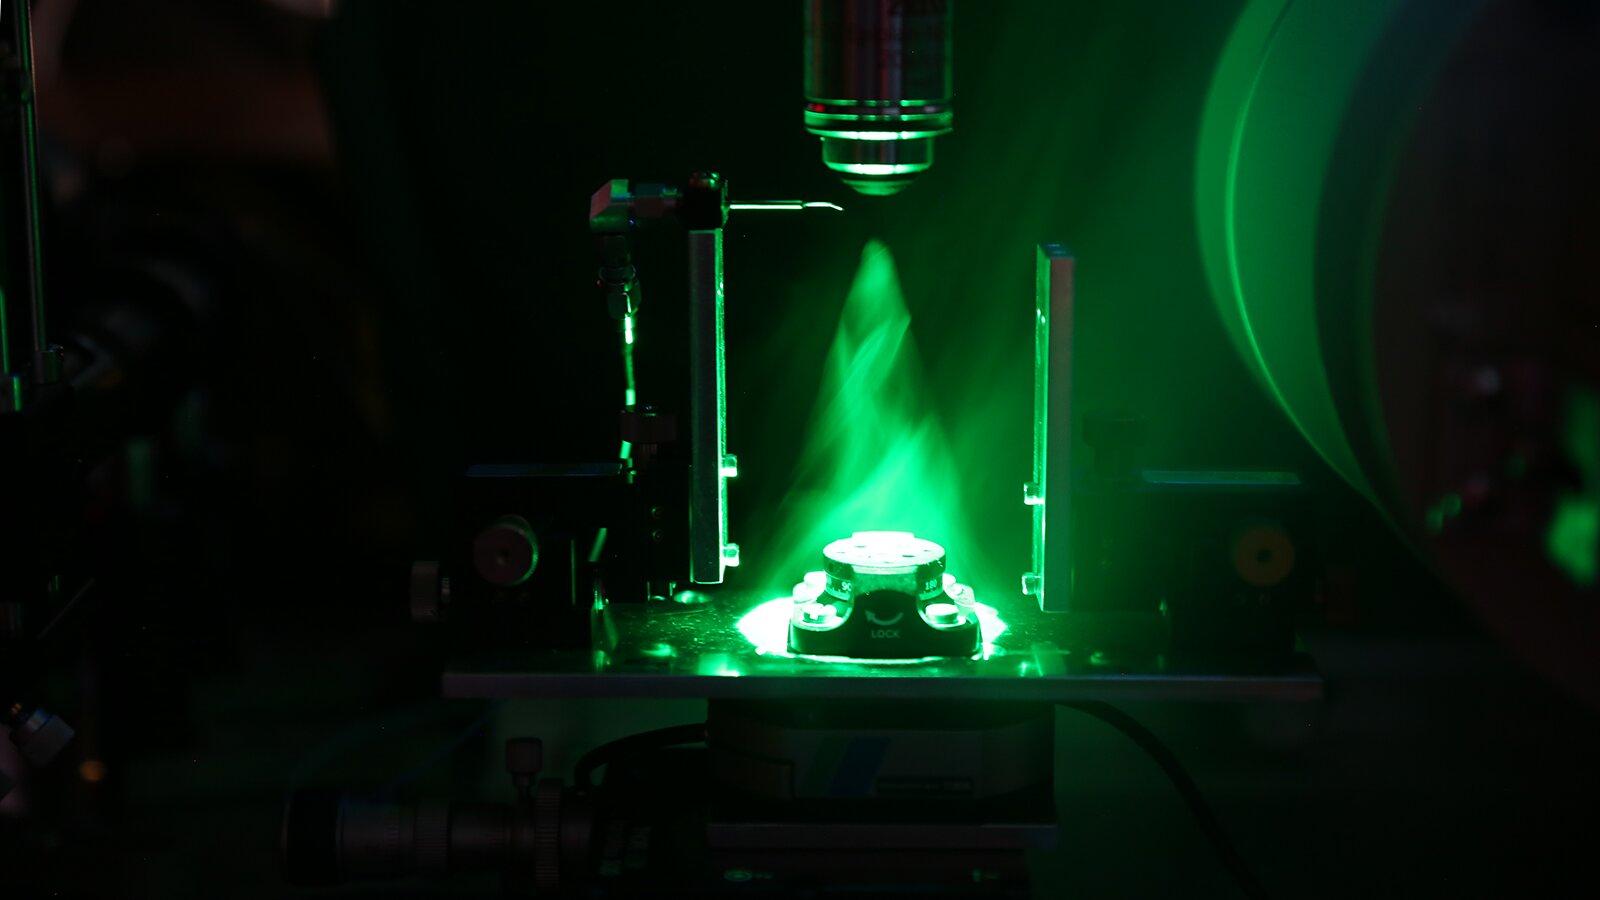 New nanoscale device for spin technology